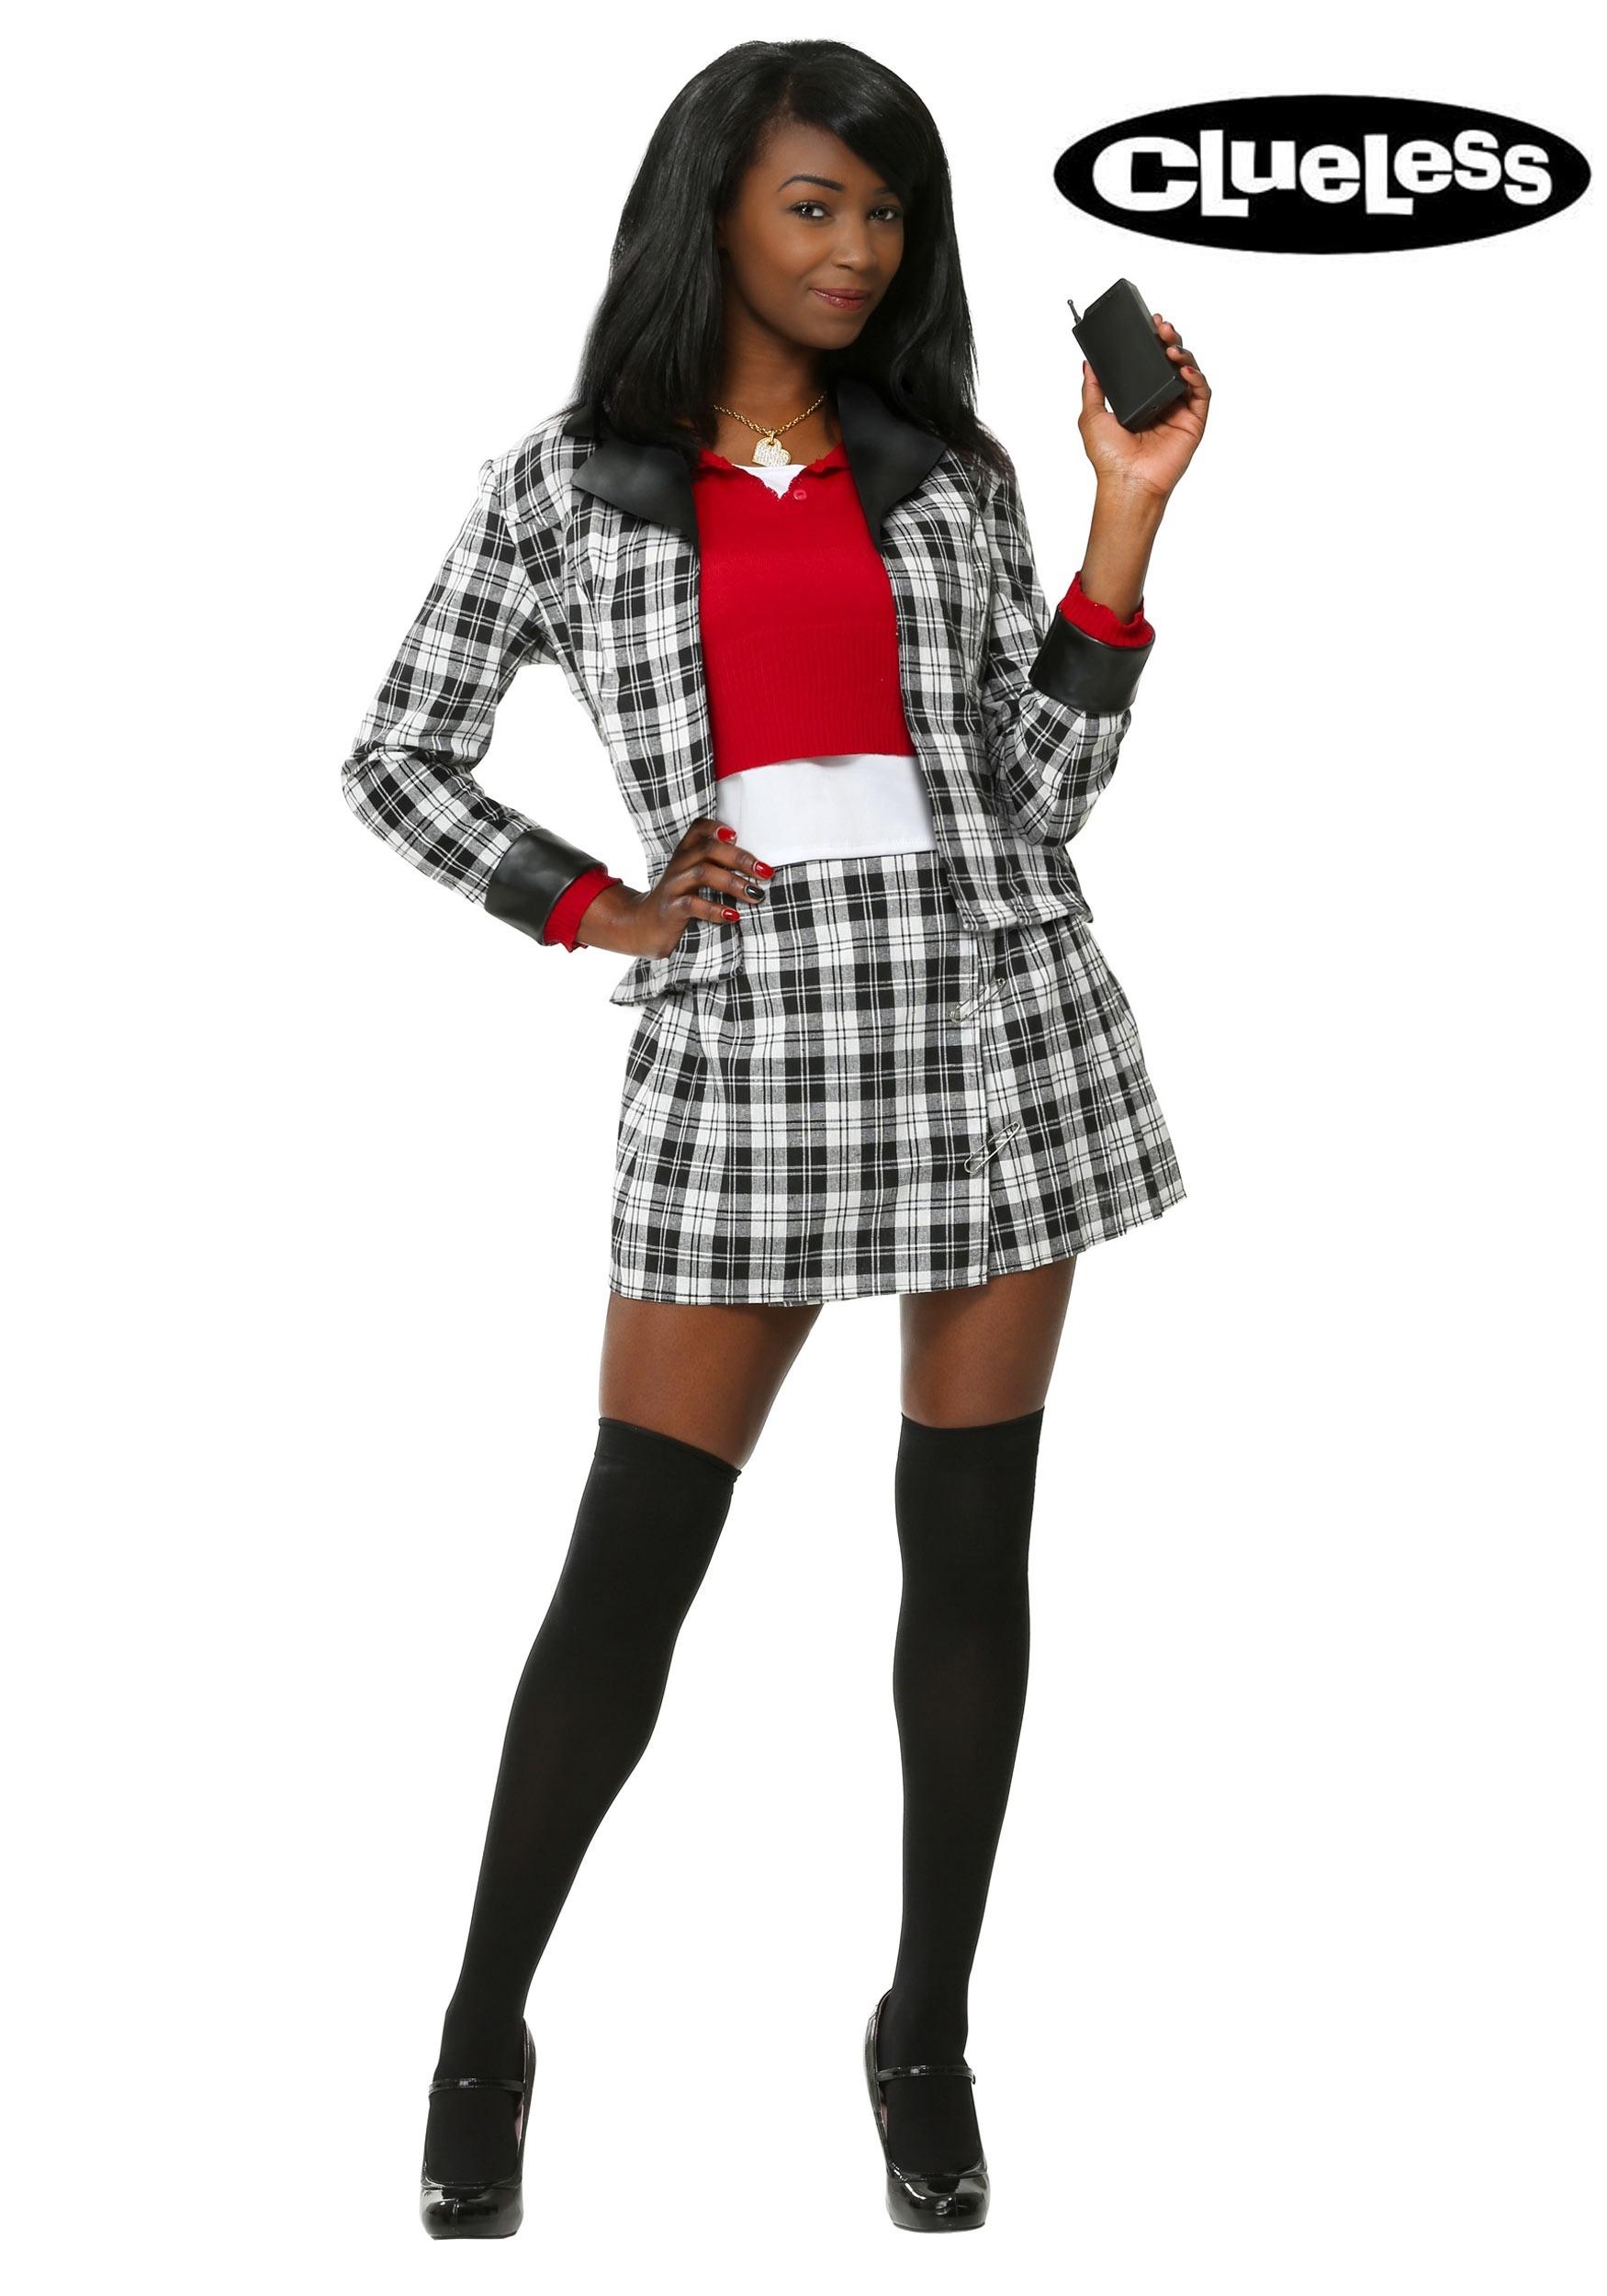 c2cb0ca00 Clueless Dee Plus Size Costume for Women 1X 2X